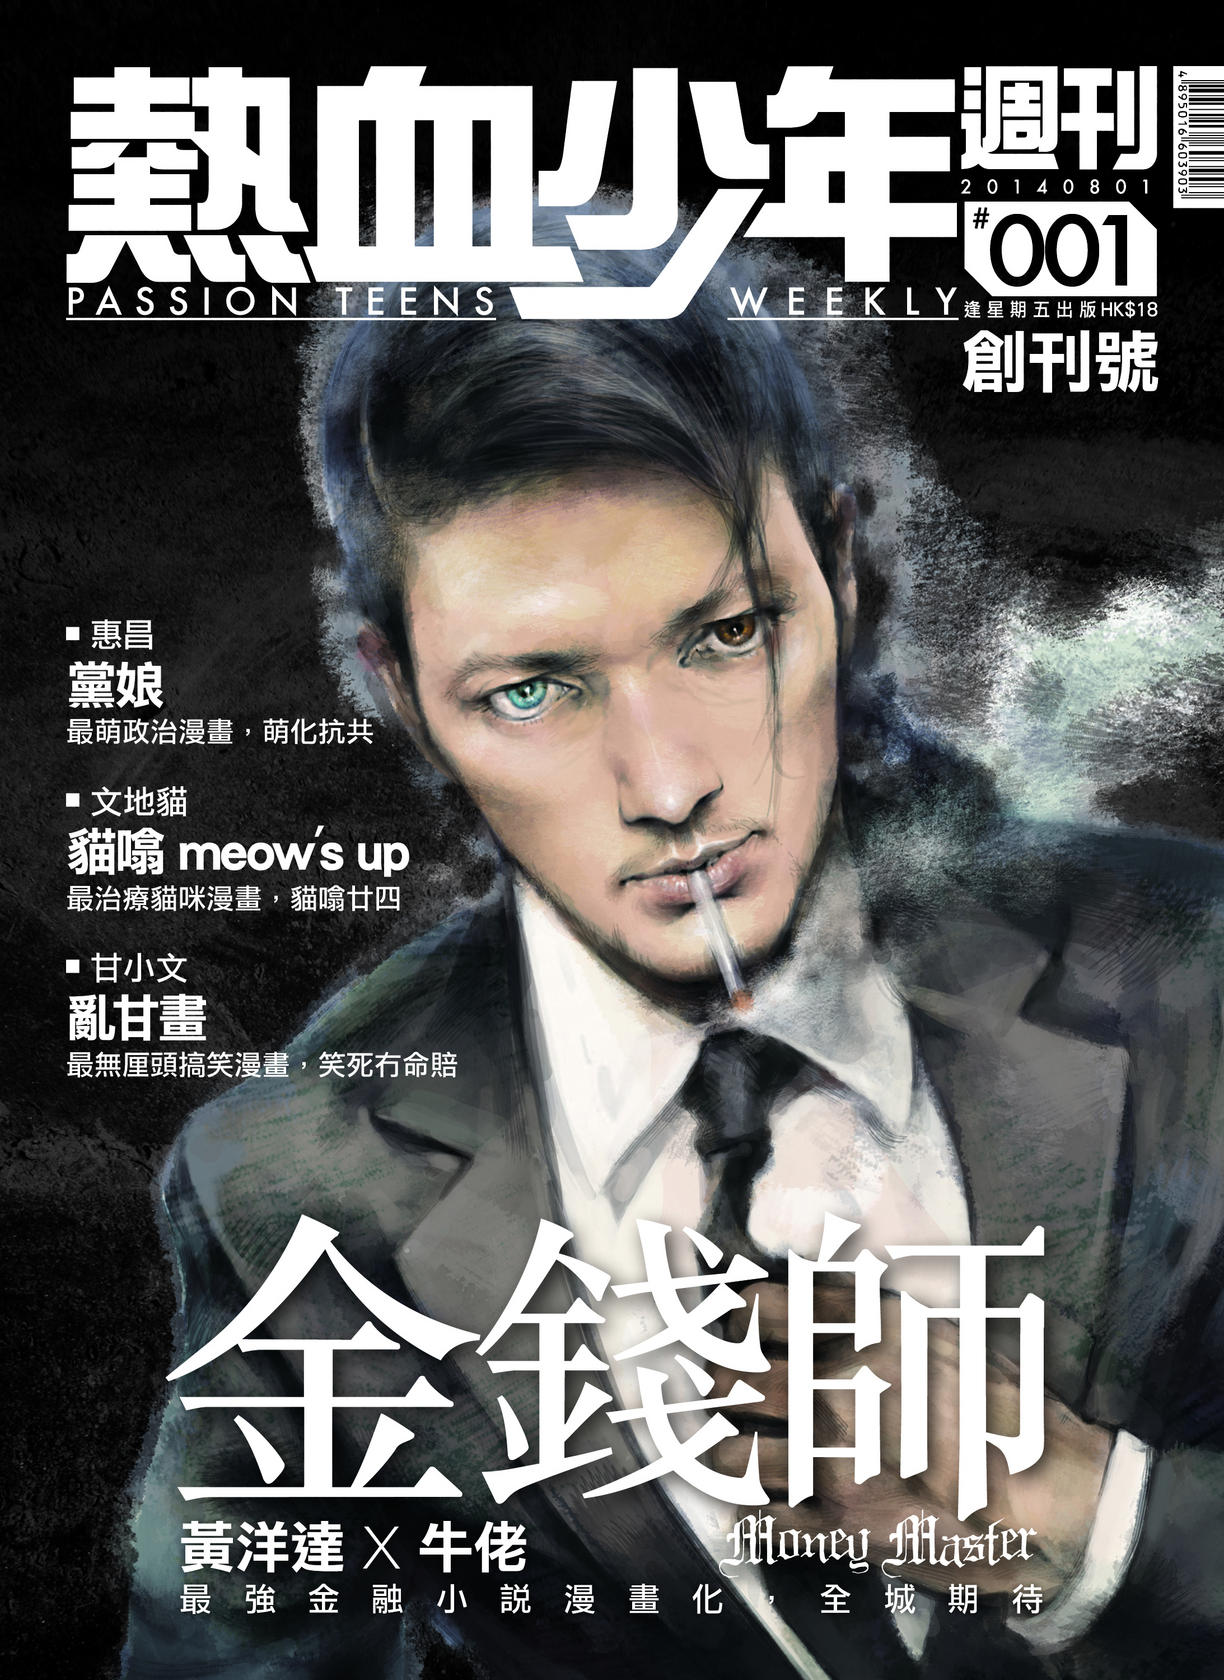 Hong Kong comic book industry struggles against rising